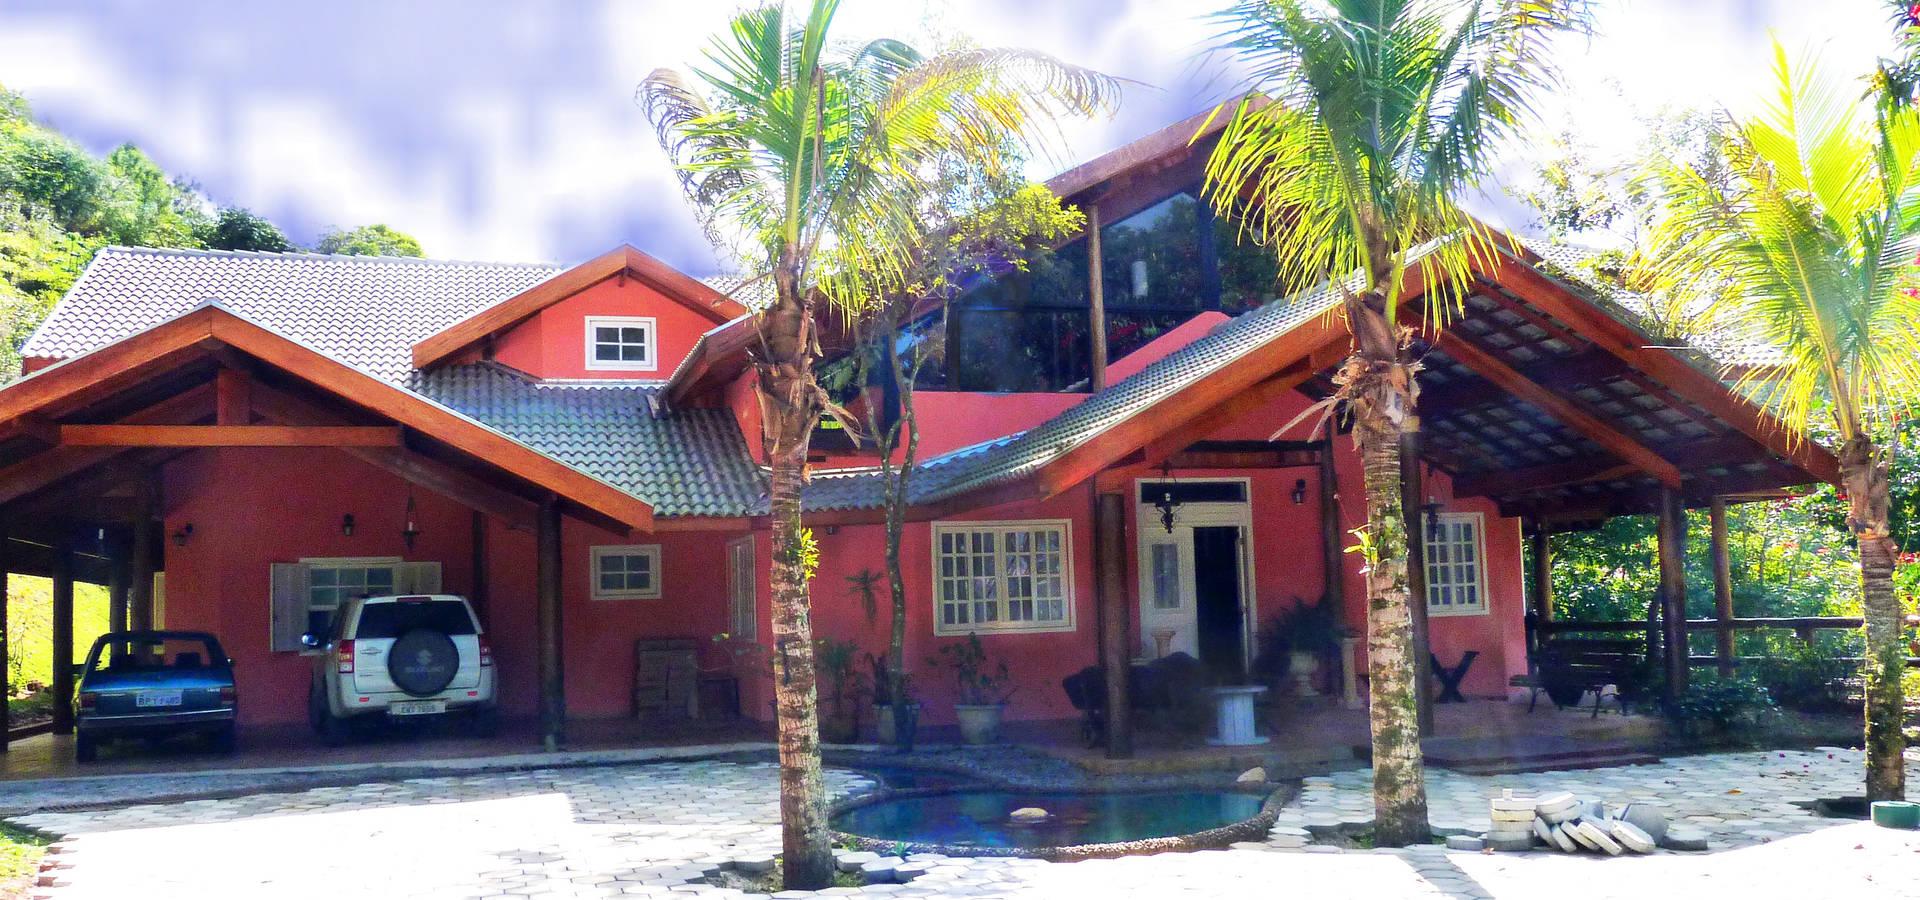 Casa de campo by elisabeth berlato arquitetura interiores for Interiores de casas